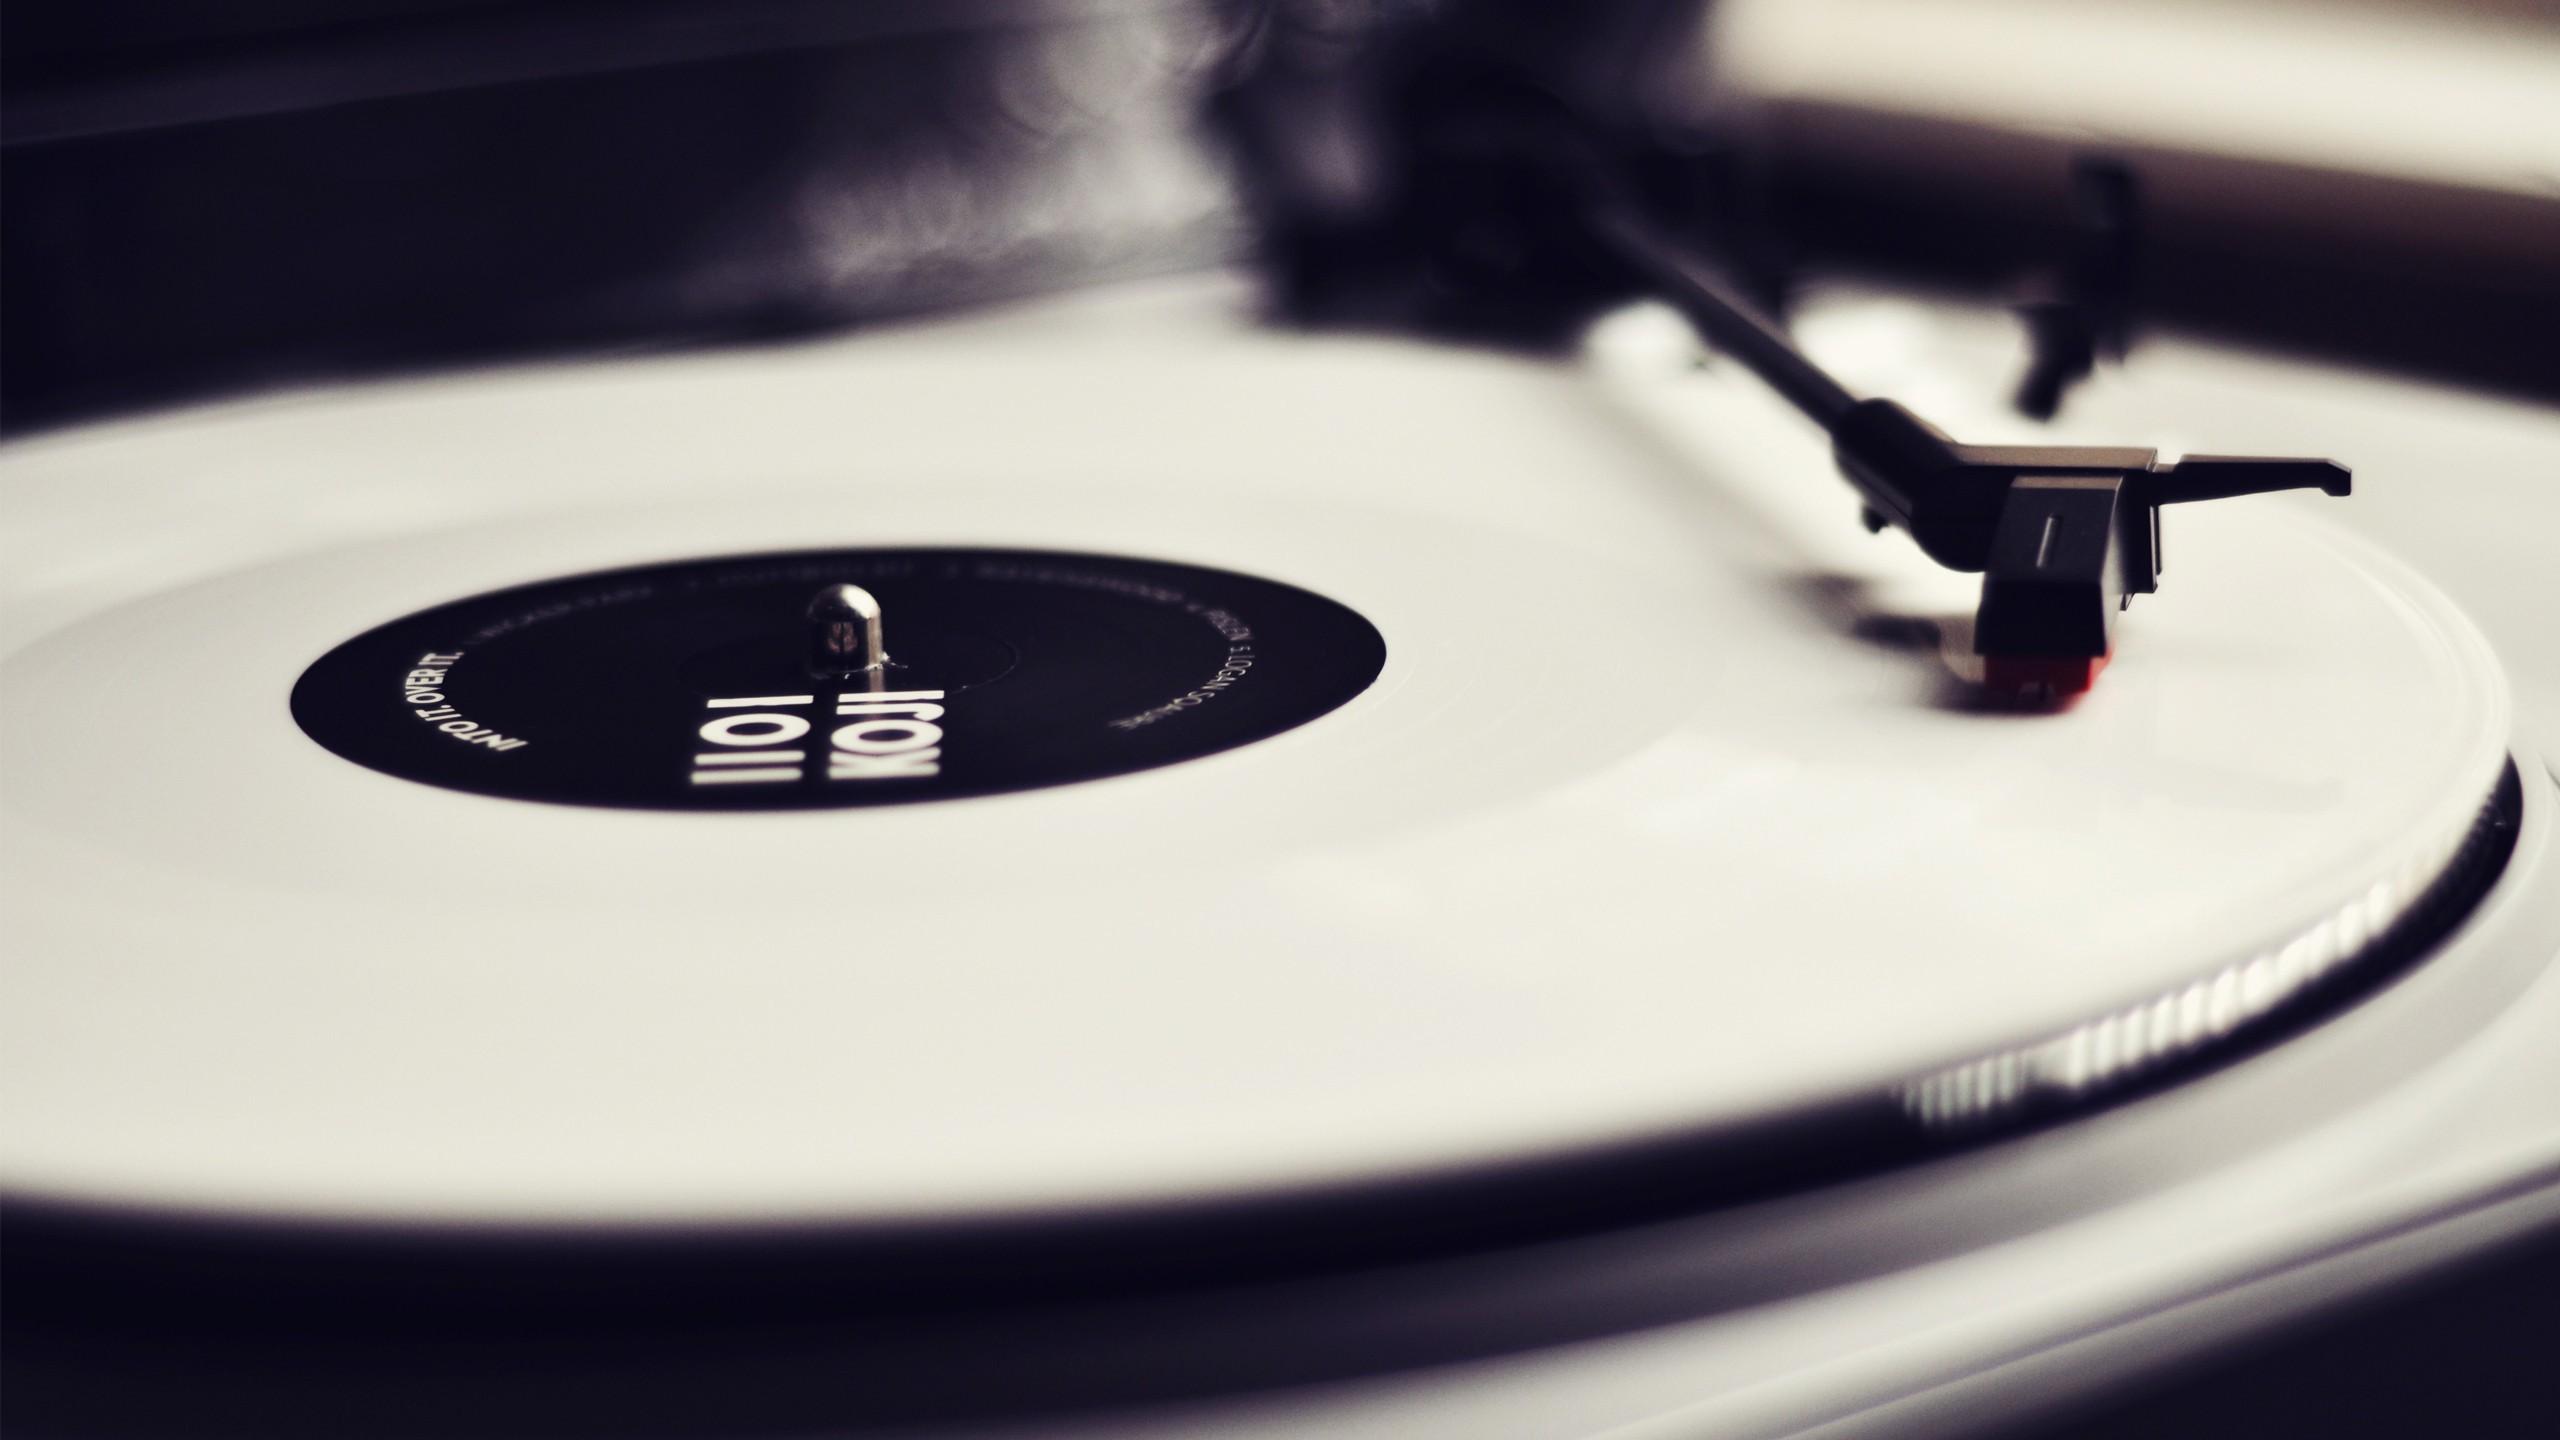 Vinyl Record Wallpaper 2560x1440 Vinyl Record Player Monochrome 2560x1440